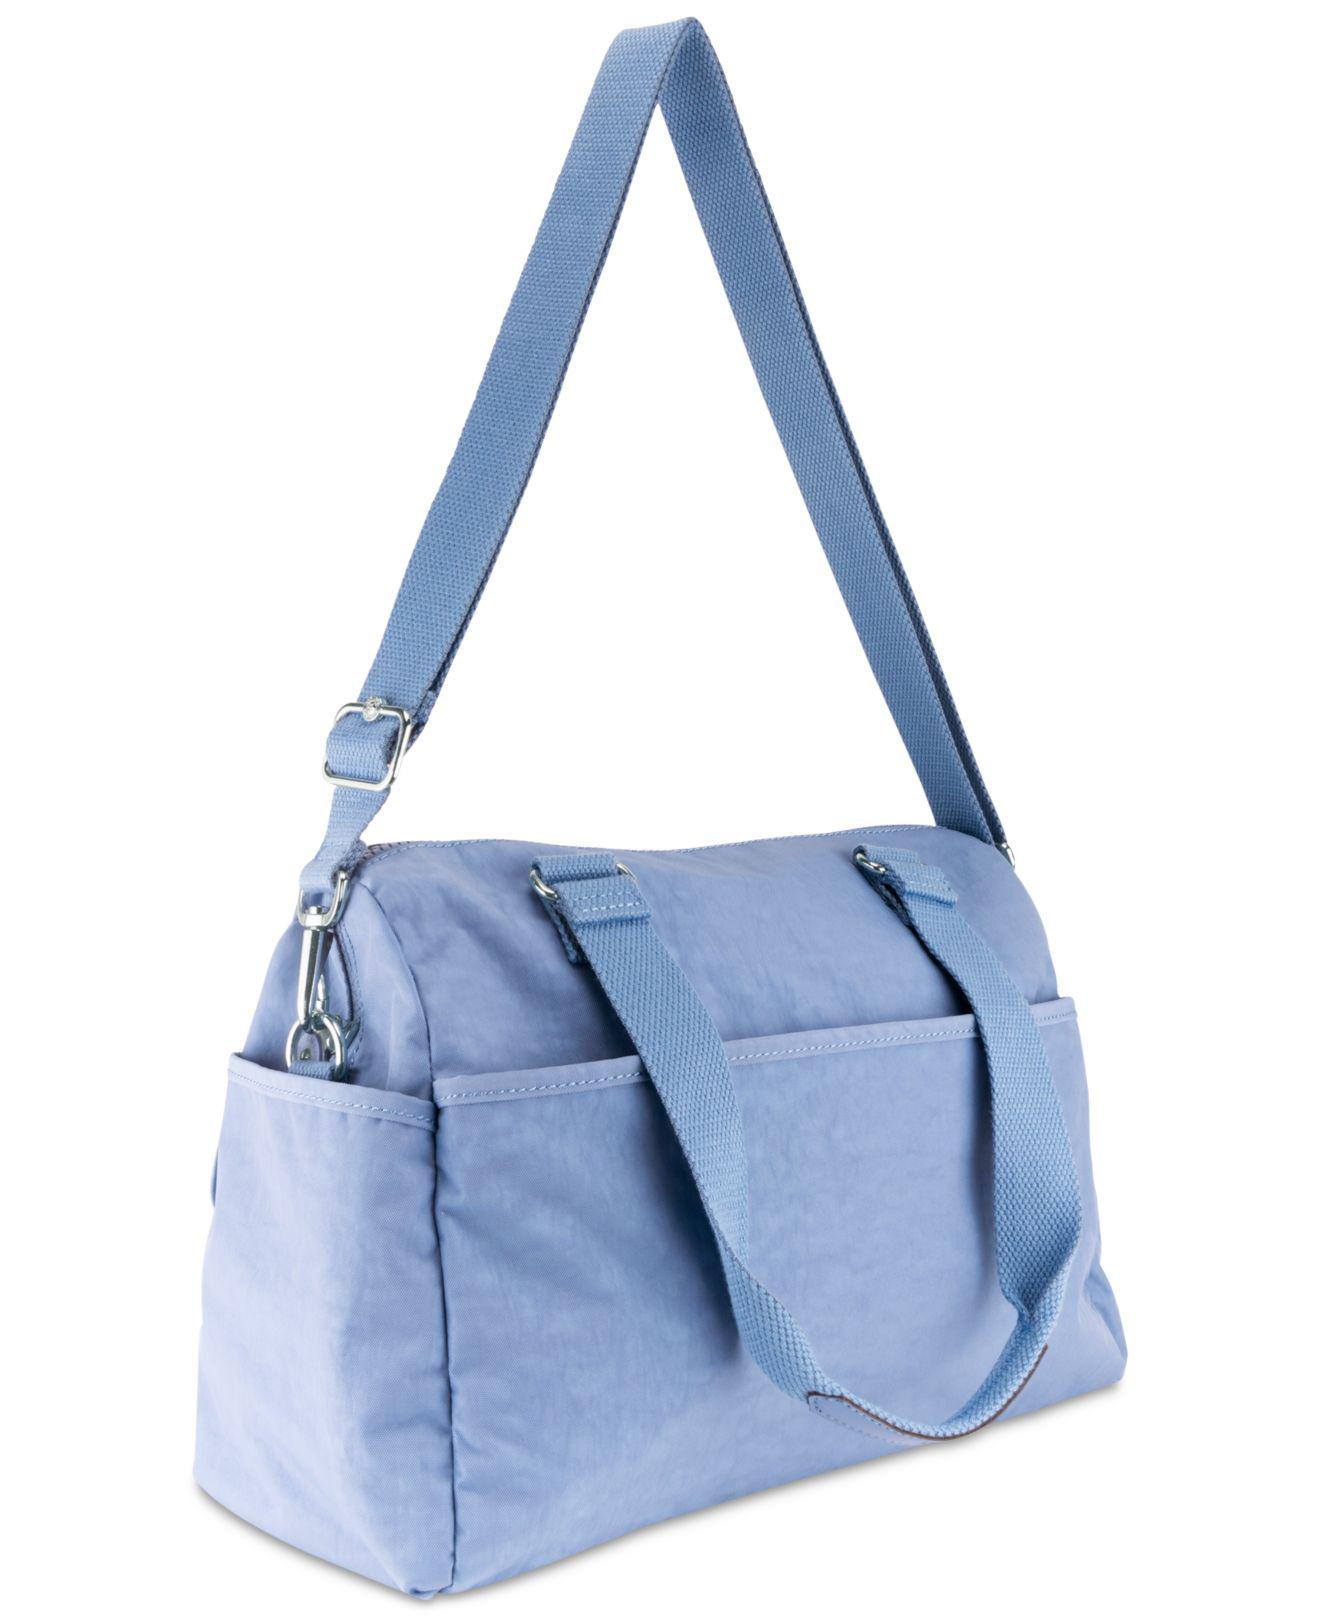 Lyst Kipling Mara Satchel In Blue